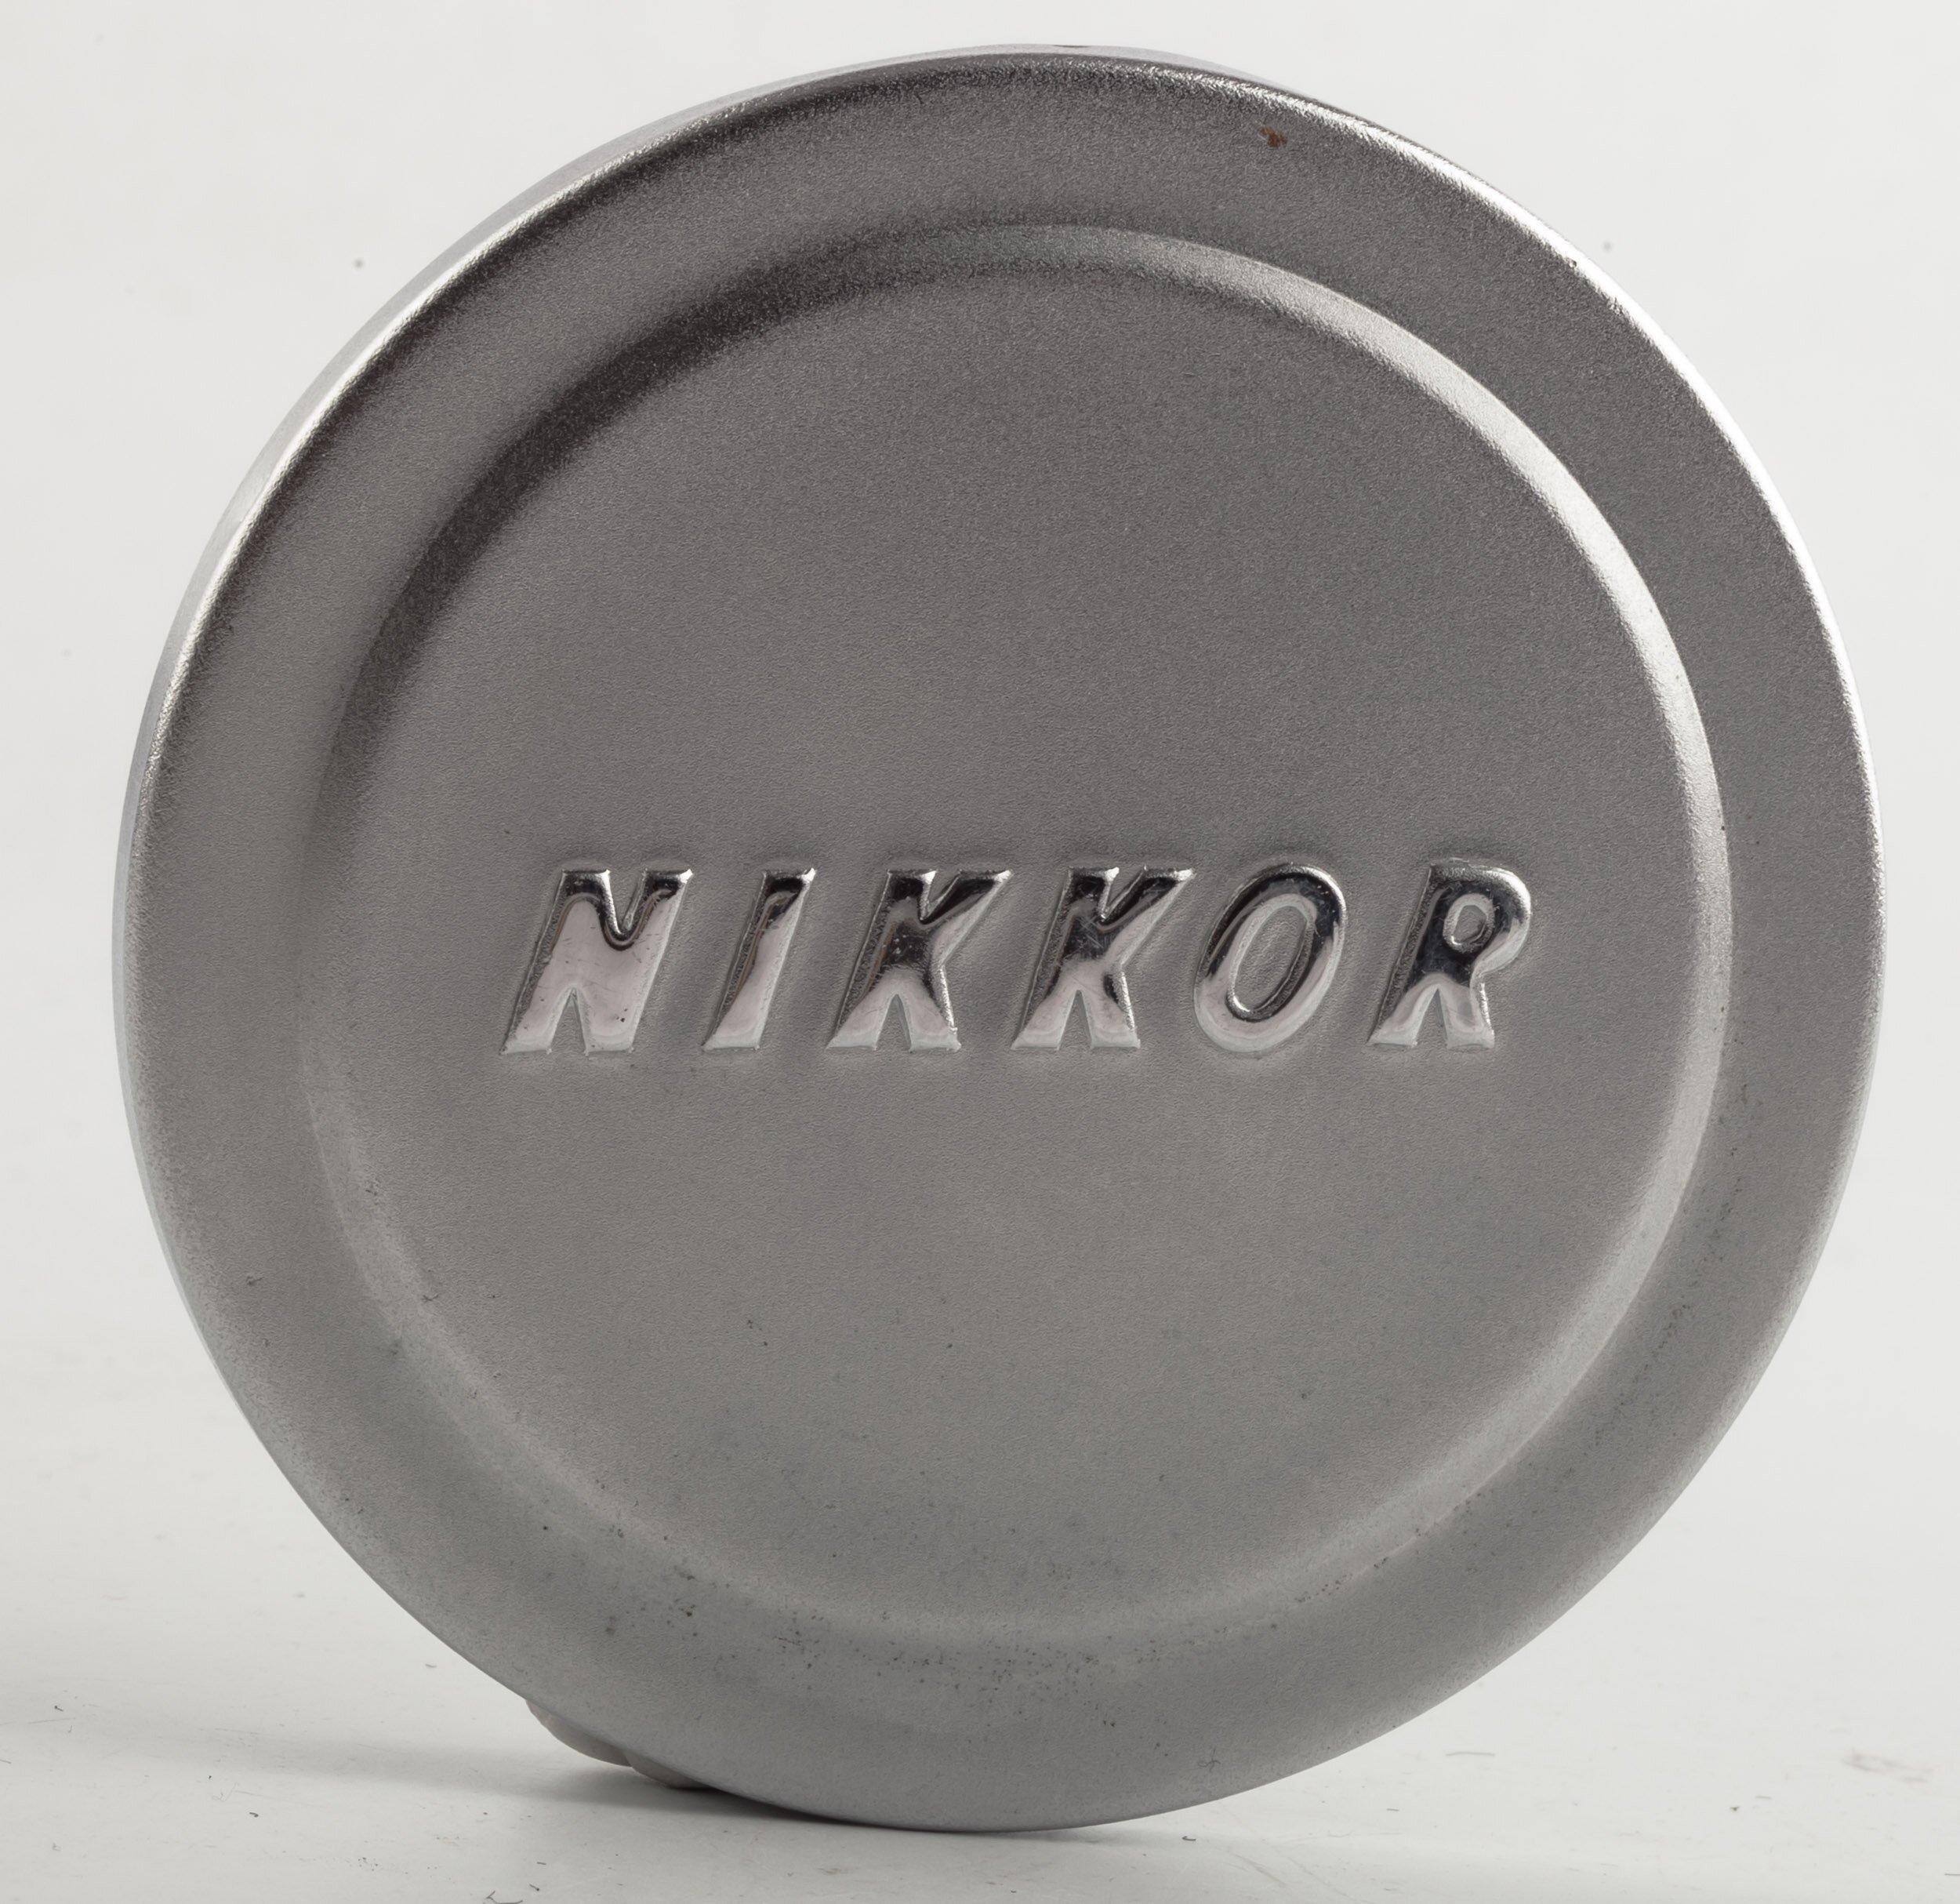 Nikon Nikkor Objektiv-Deckel silber Metall Ø100mm